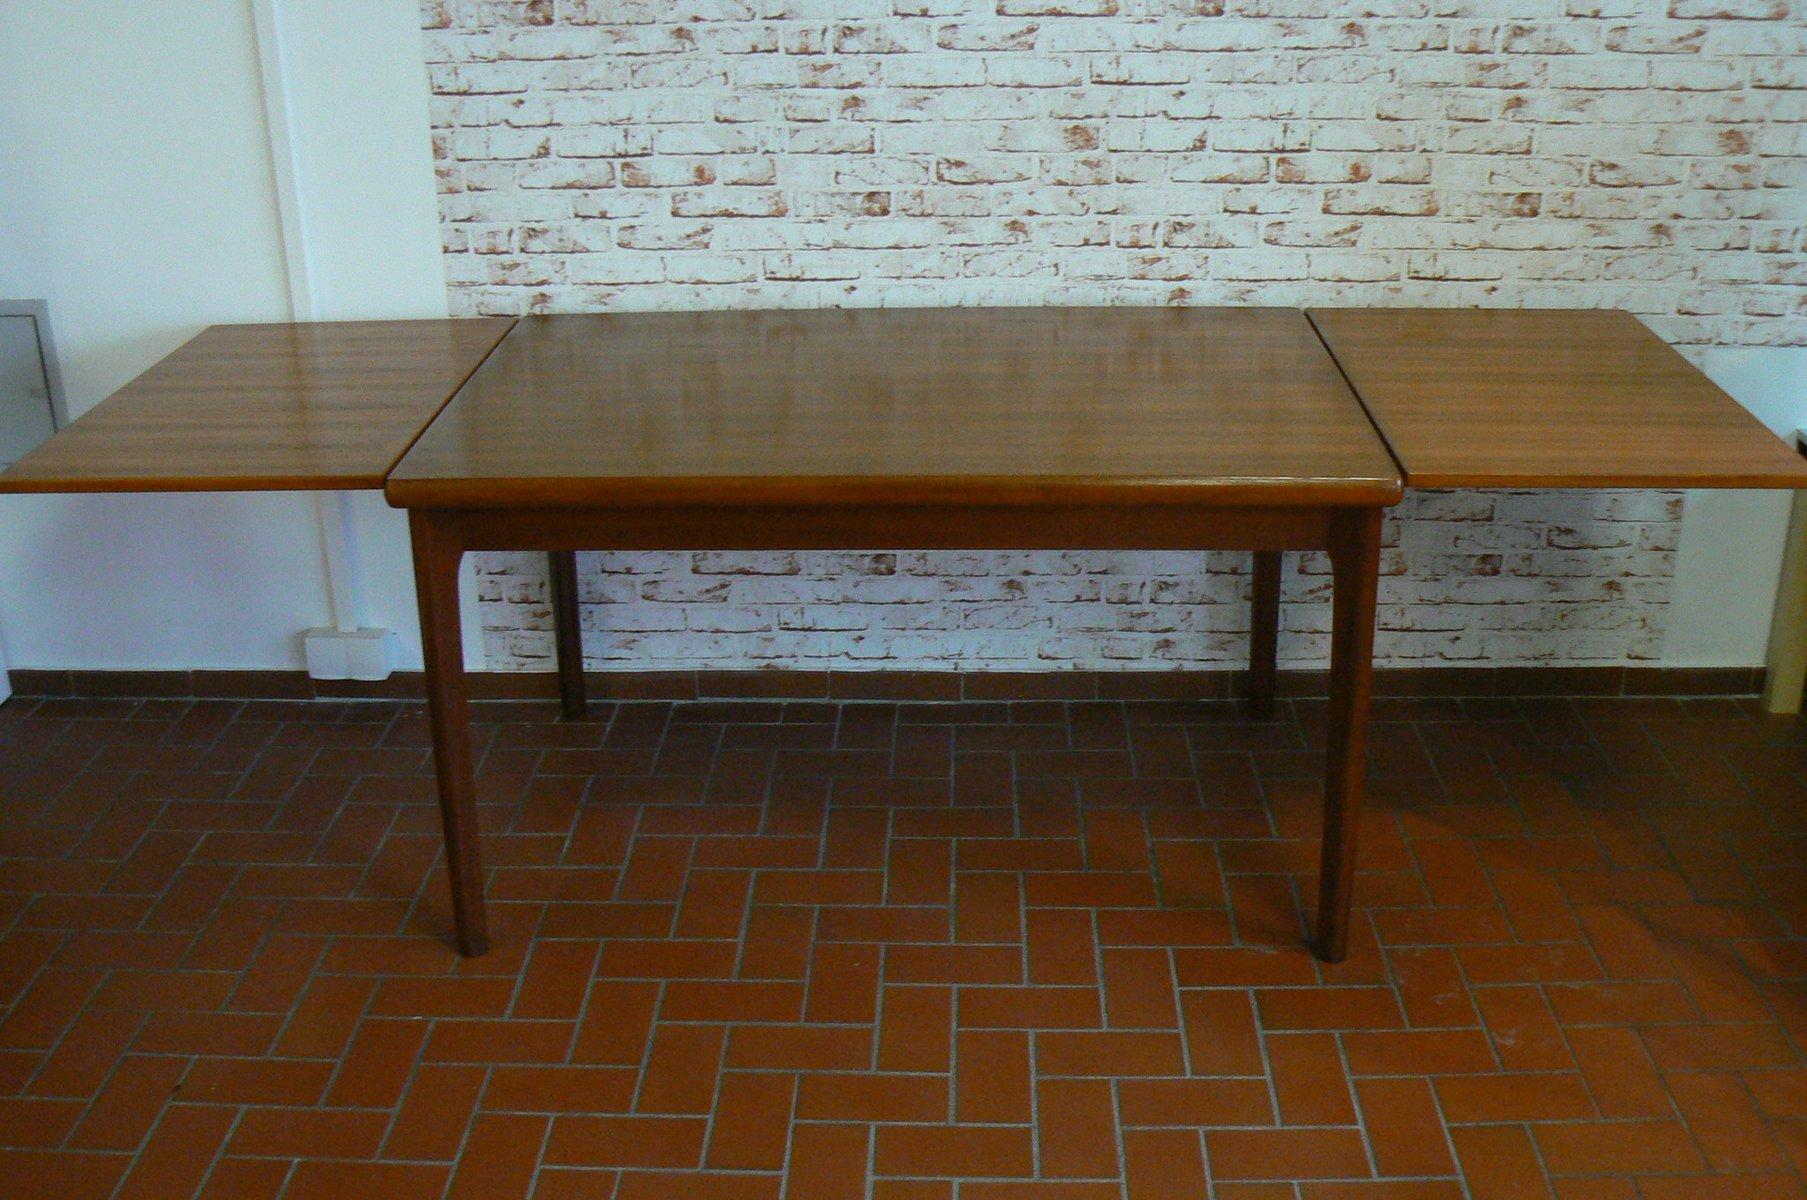 table de salle manger vintage rallonge par henning kjaernulf pour am denmark en vente sur pamono. Black Bedroom Furniture Sets. Home Design Ideas